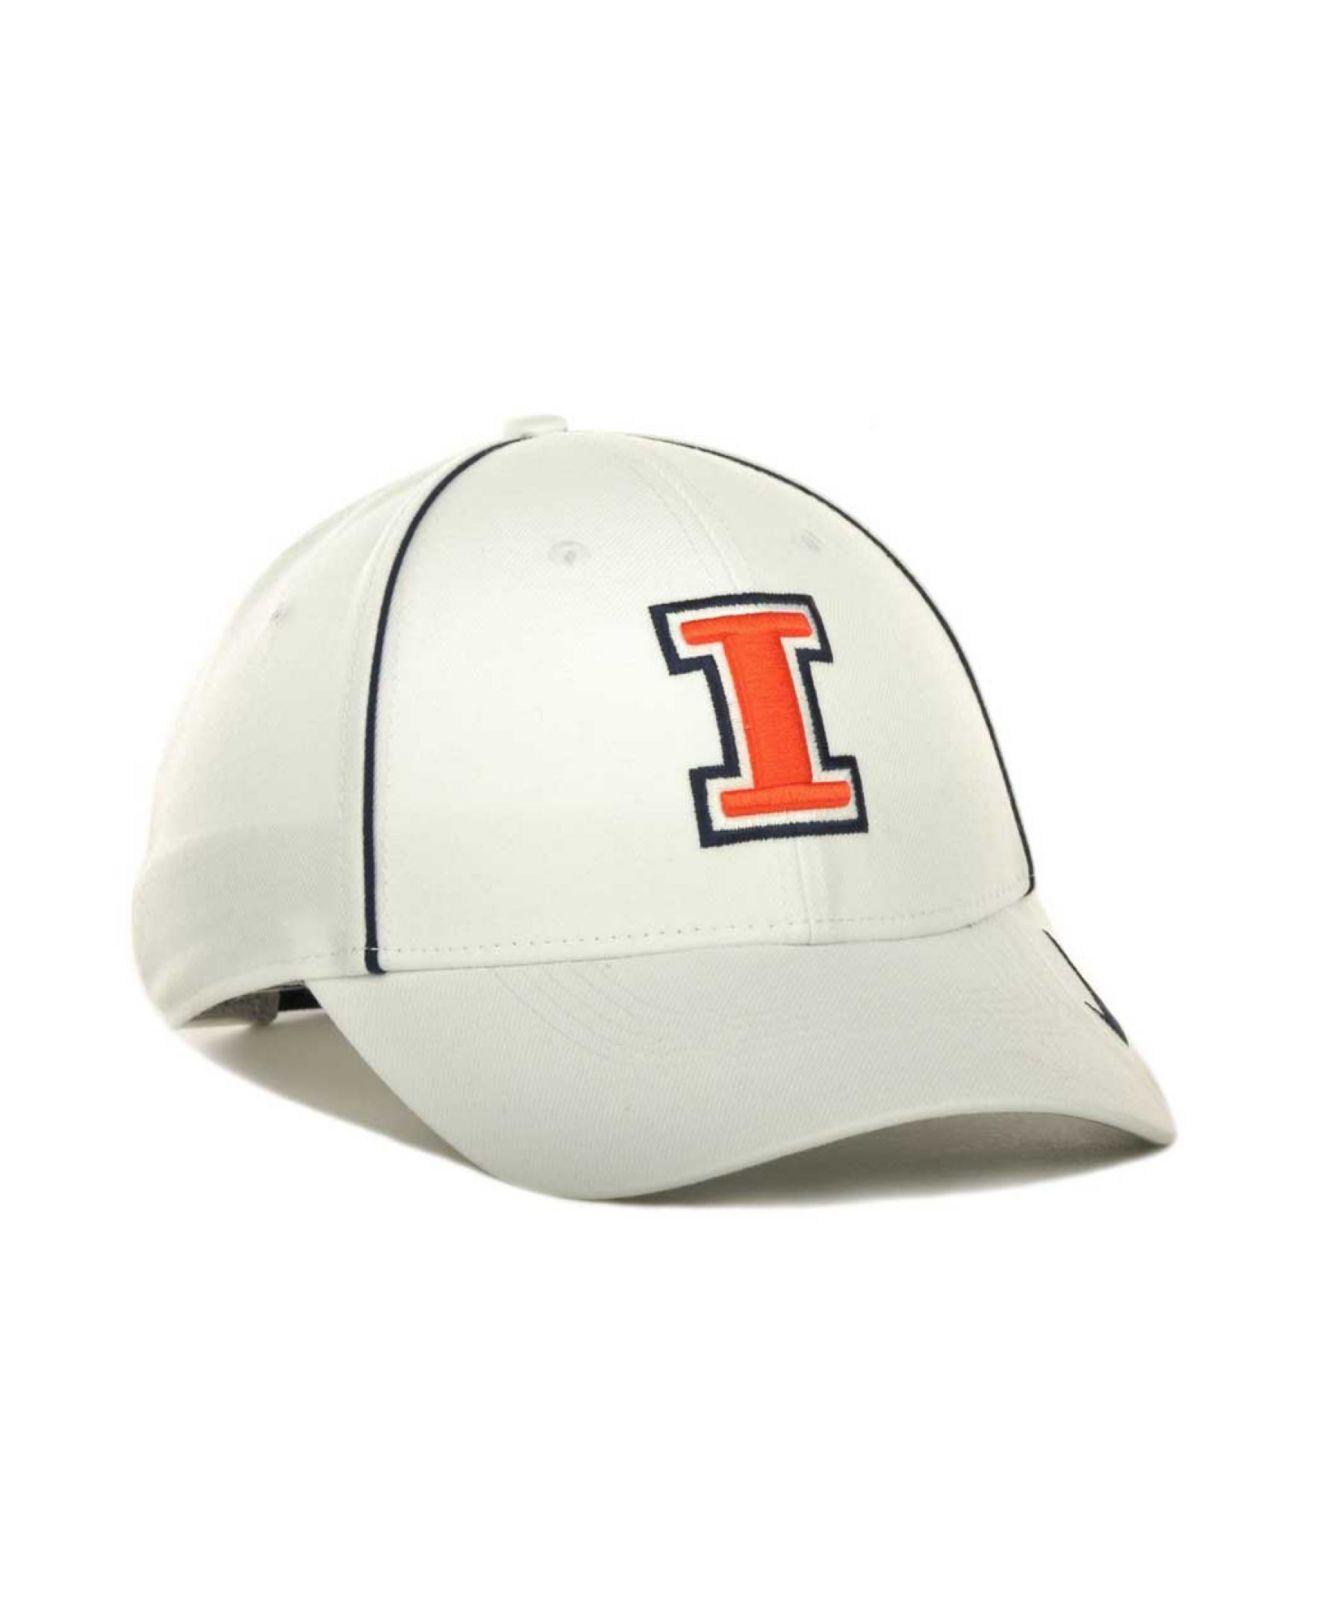 size 40 49781 51117 Lyst - Nike Illinois Fighting Illini Sideline Legacy 91 Cap in White ...